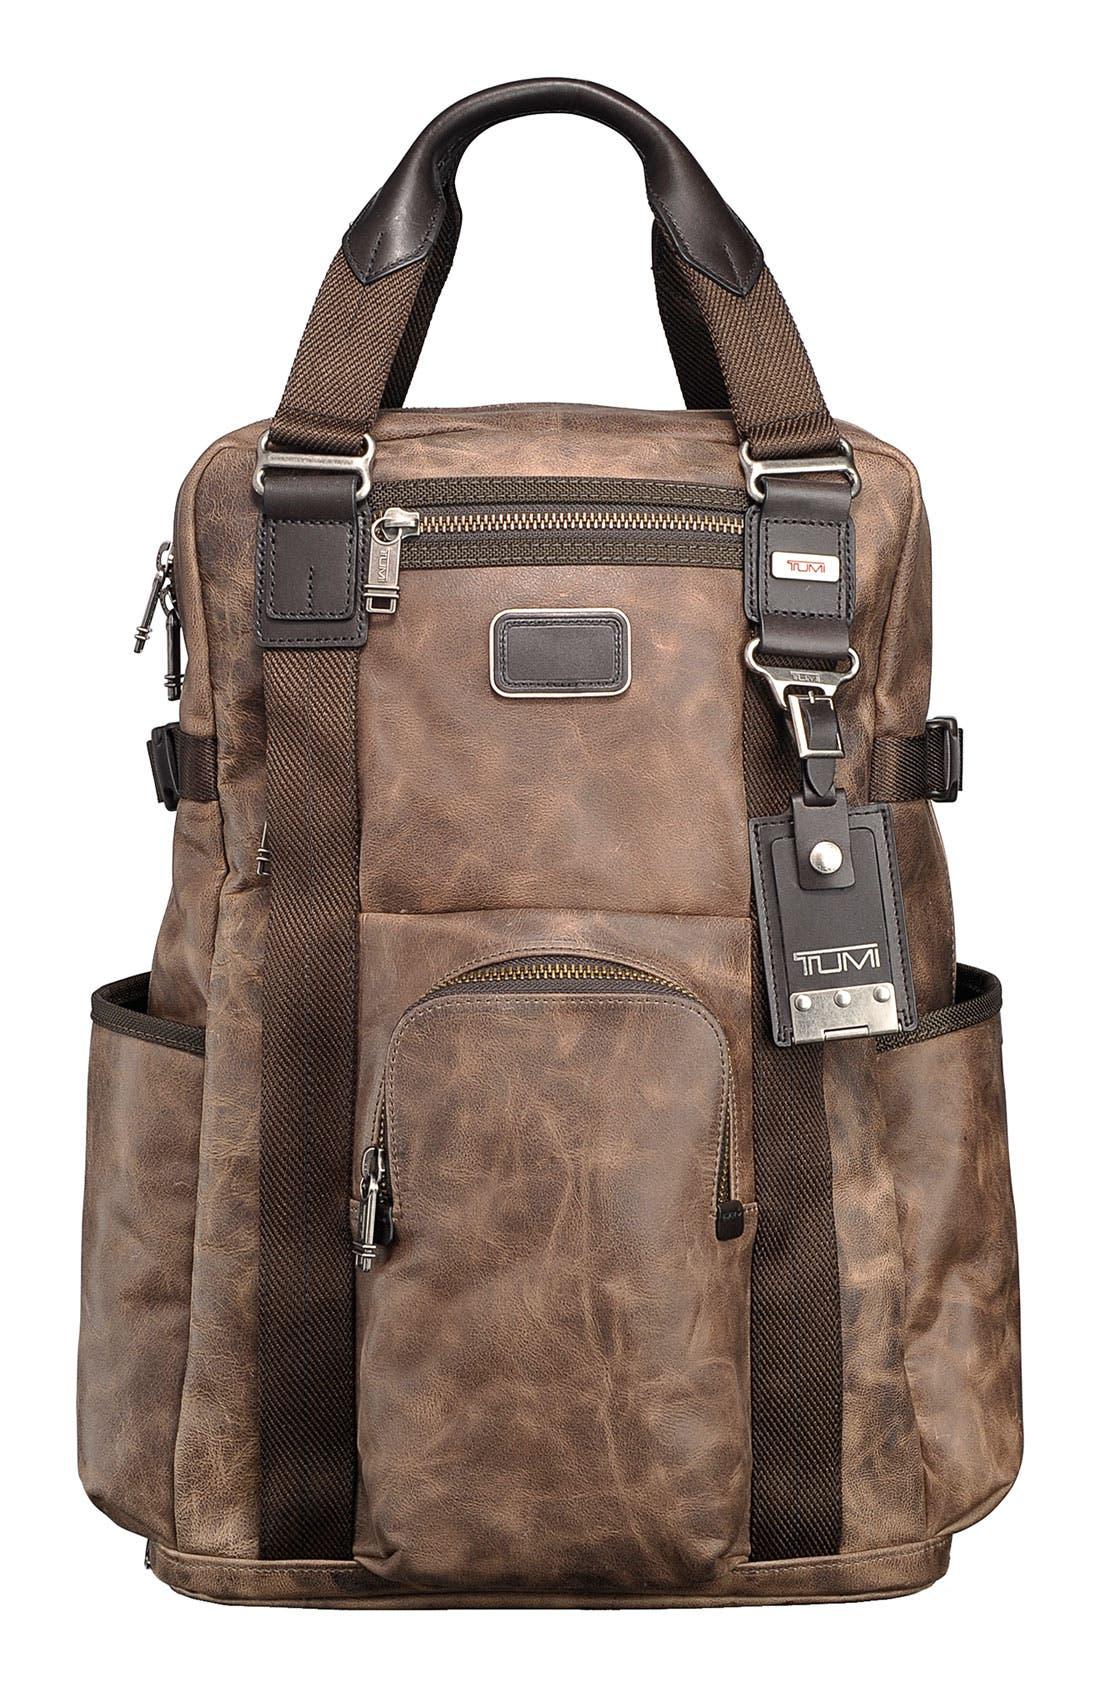 Alternate Image 1 Selected - Tumi 'Bravo - Lejune' Backpack Tote